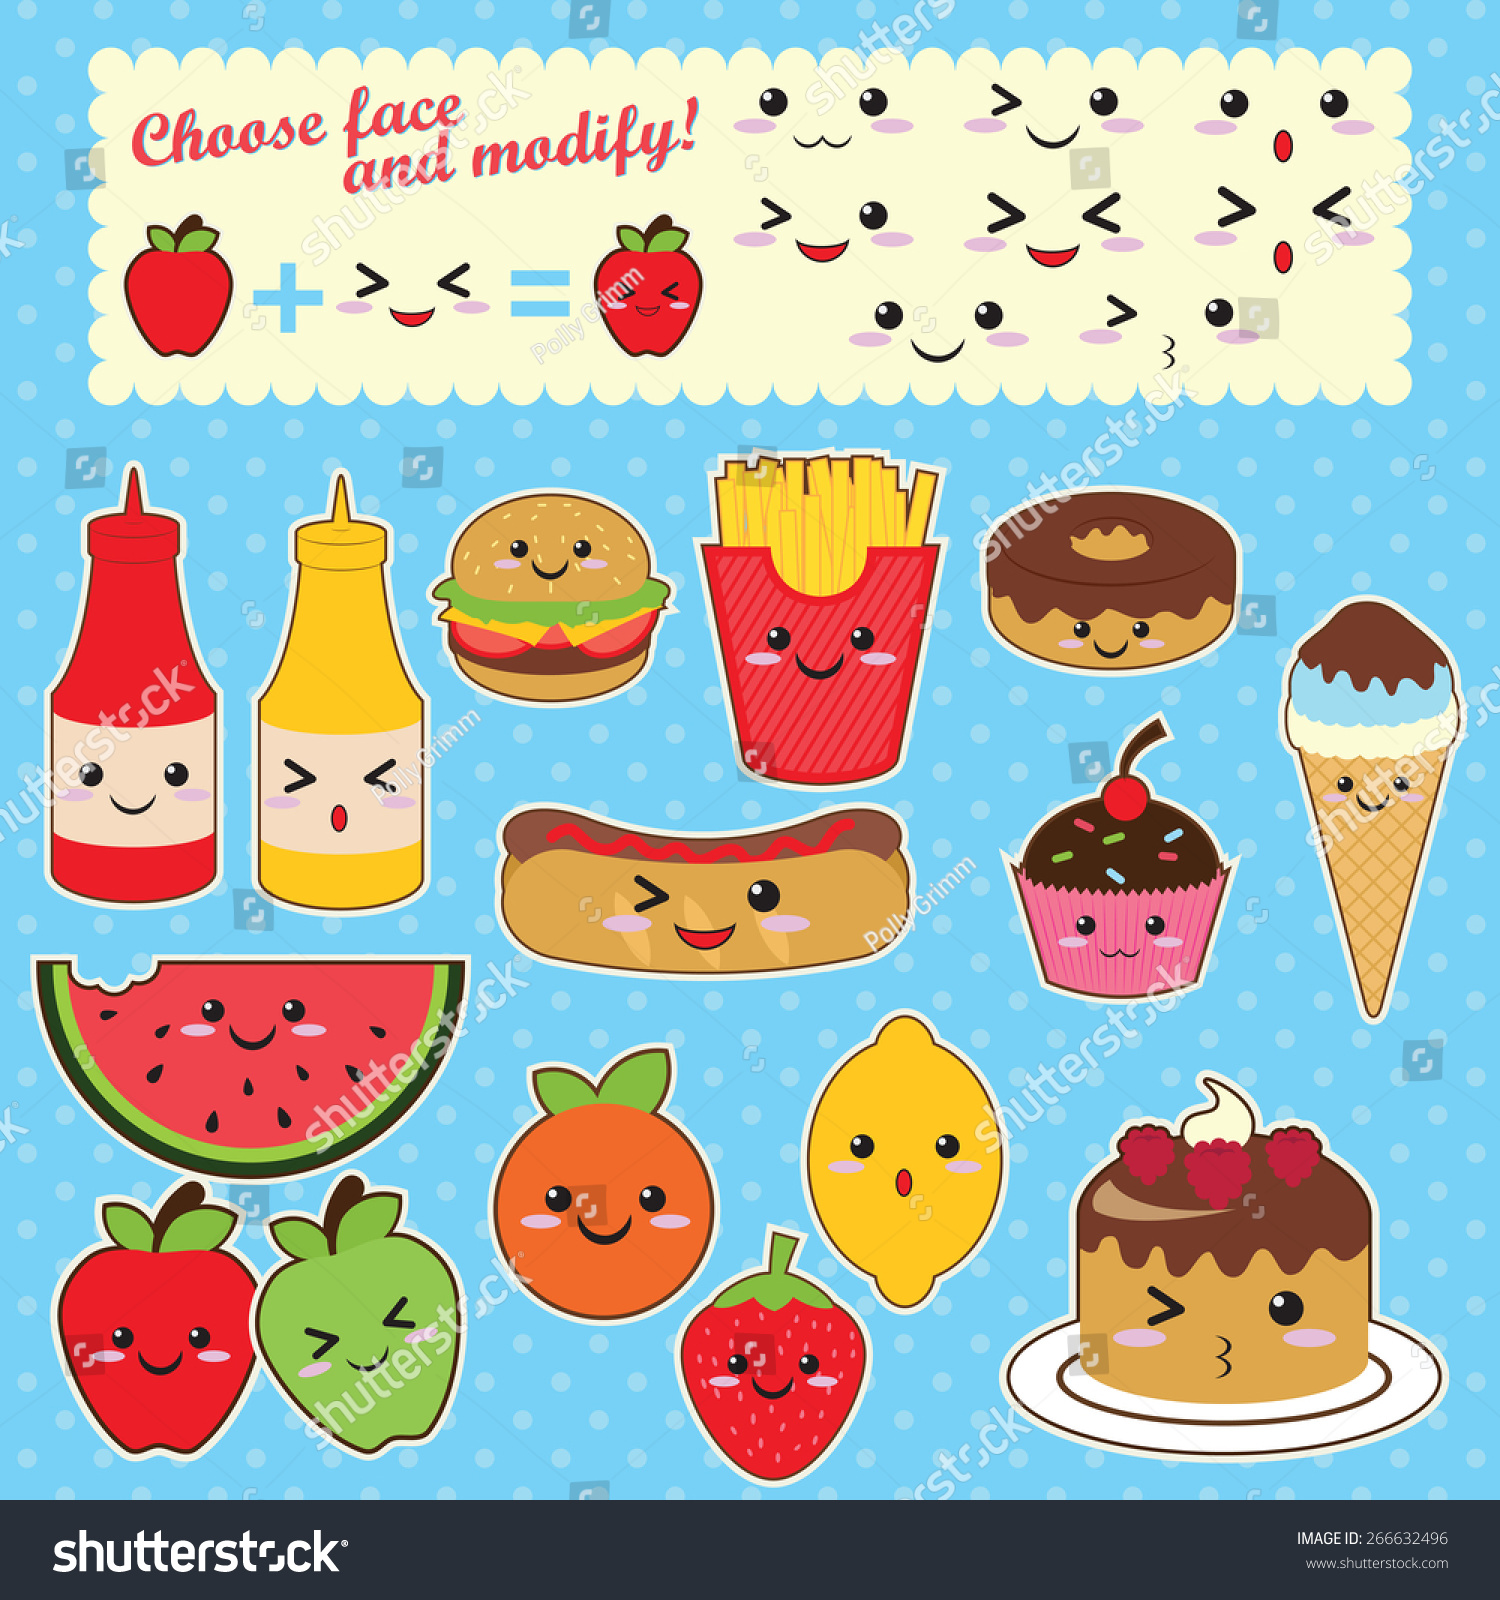 Uncategorized Cute Kawaii Food cute kawaii food characters fast stock vector 266632496 sweet fruit